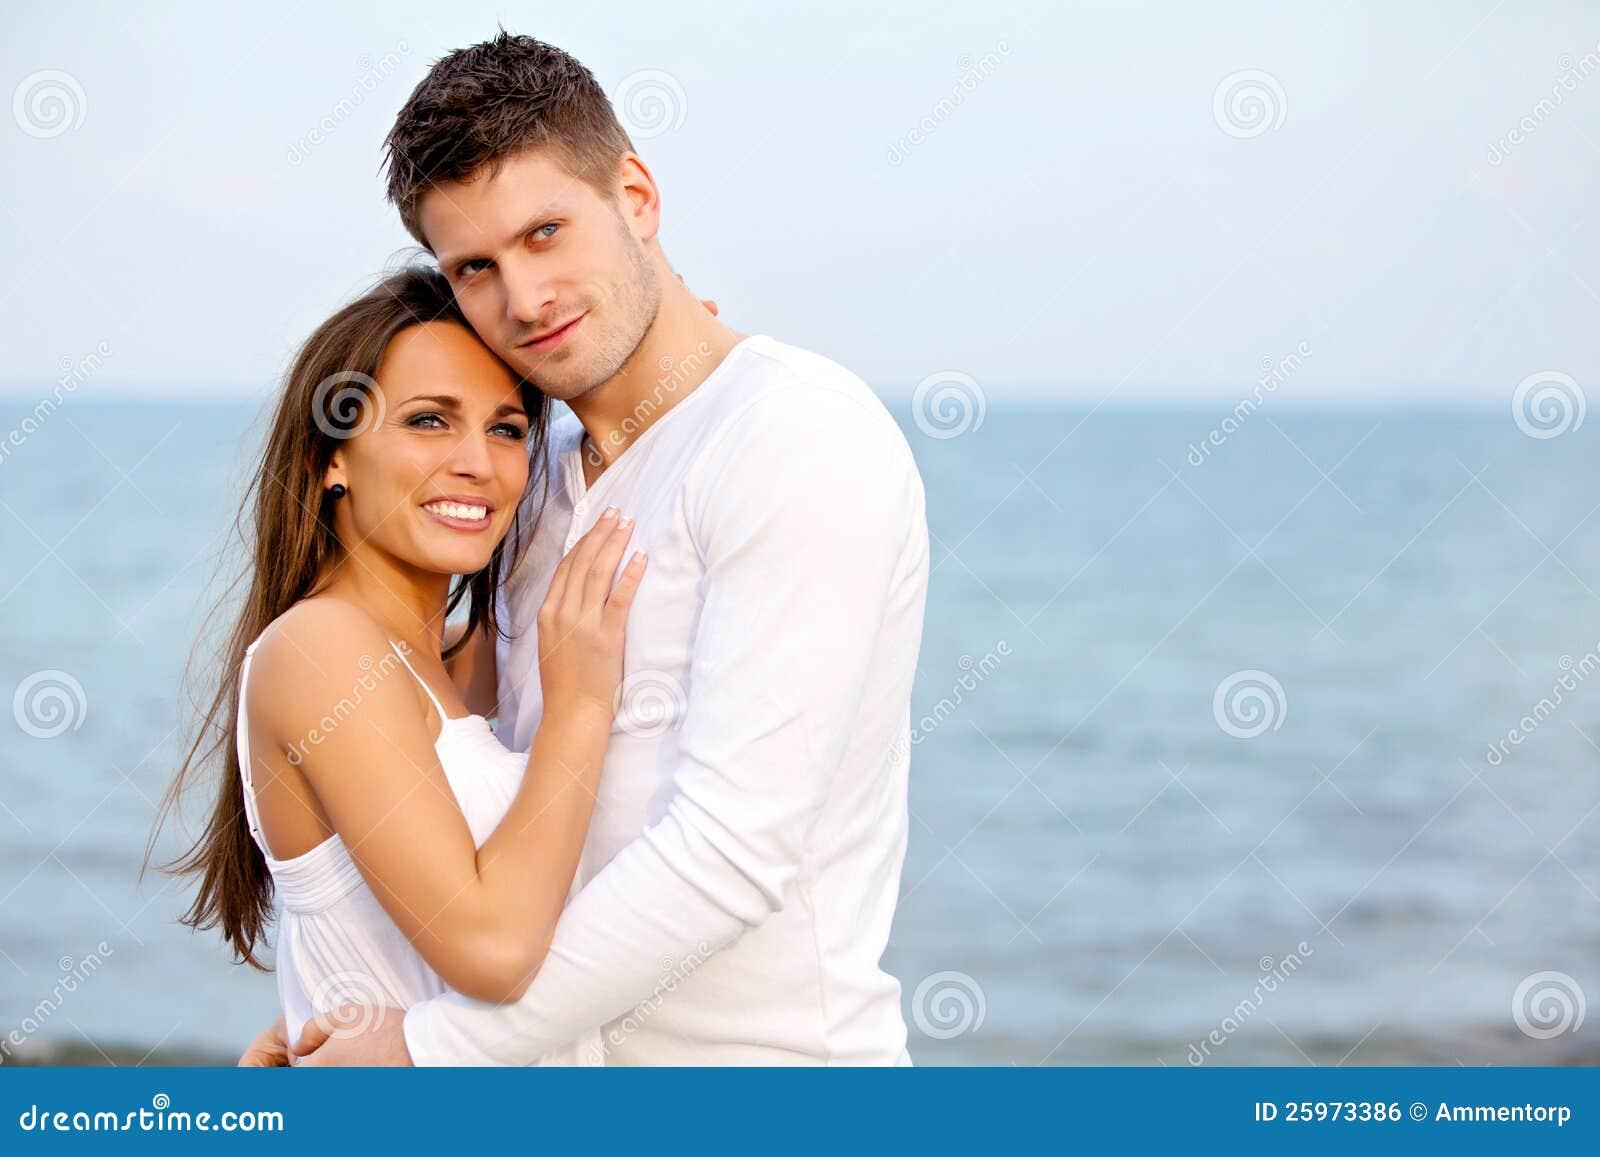 Couple In Romantic Pose Images Mount Mercy University